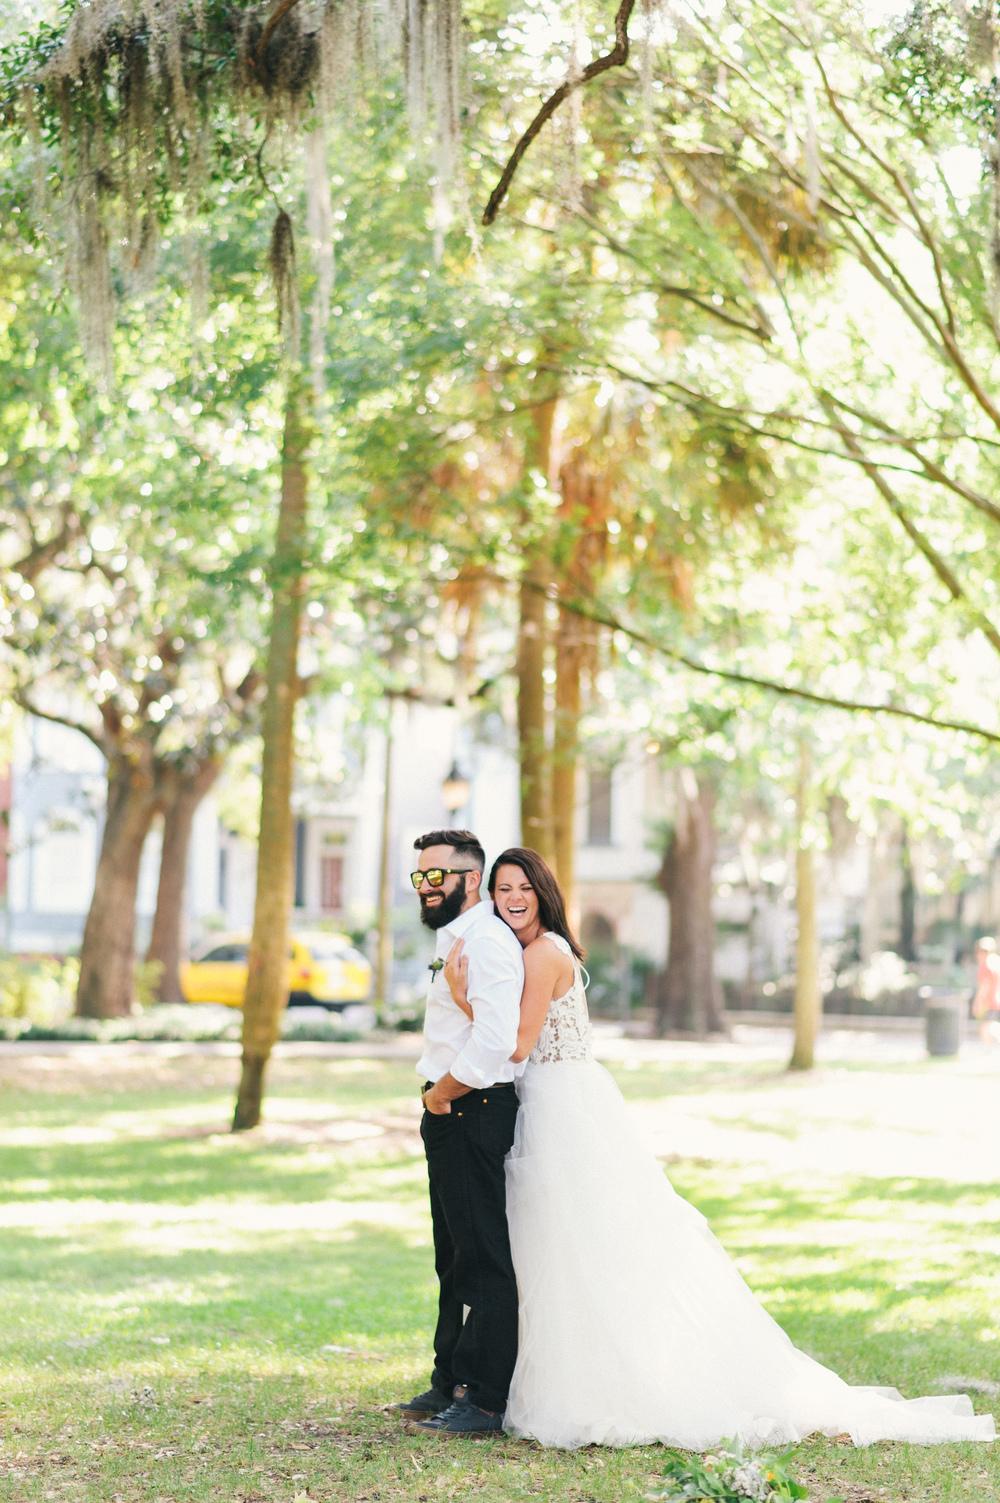 Wedding Planners Savannah Ga | Meghan Hill Photography Savannah Elopement